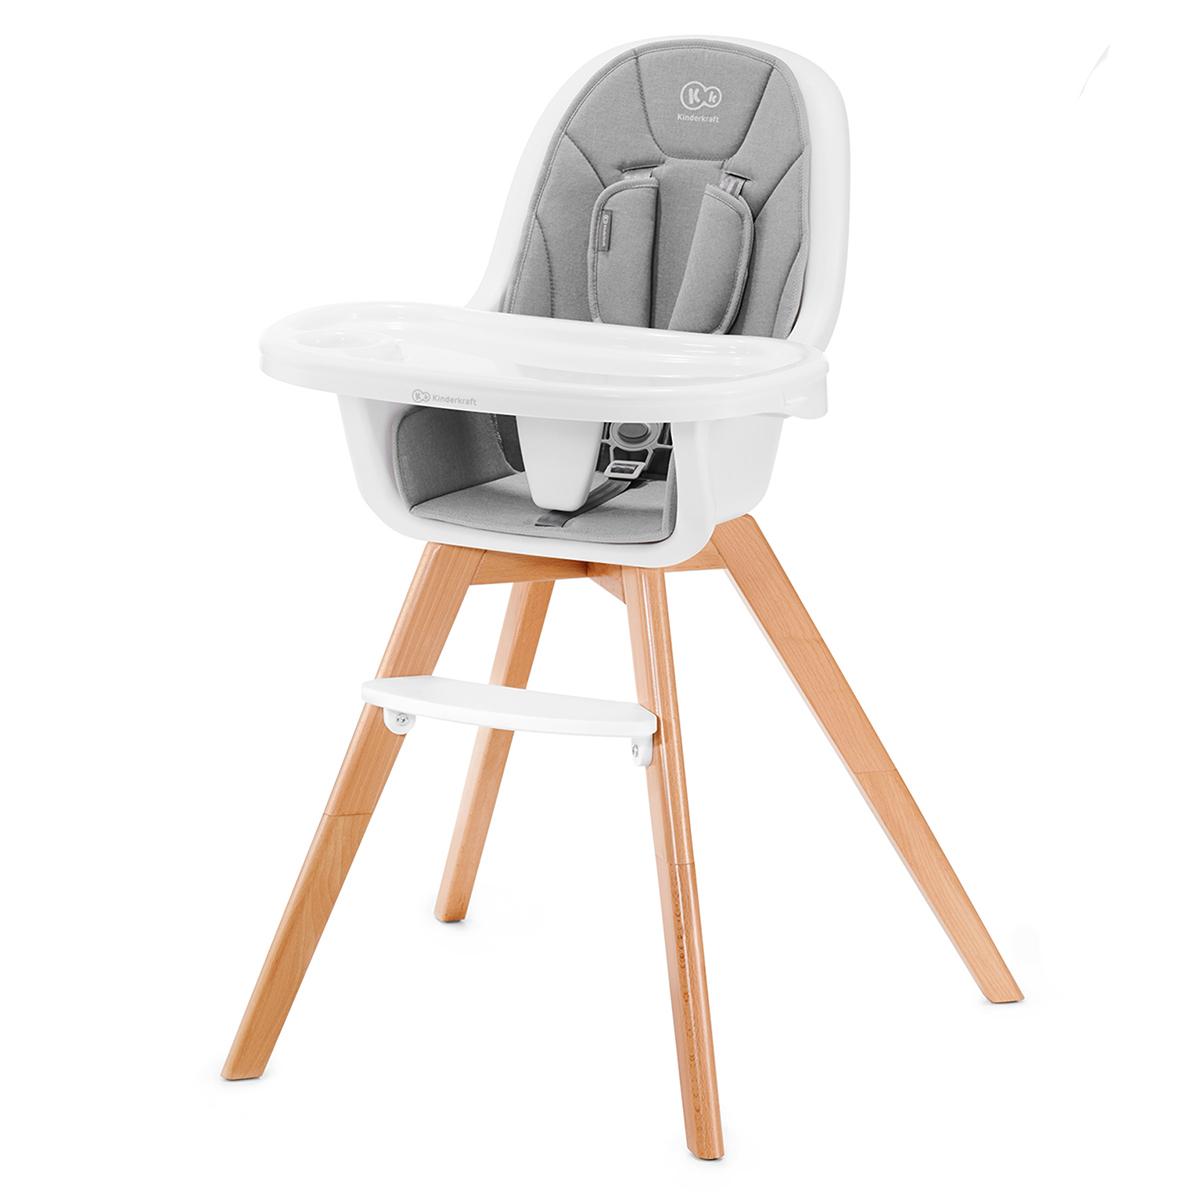 Chaise haute Chaise Haute TIXI - Grey Chaise Haute TIXI - Grey